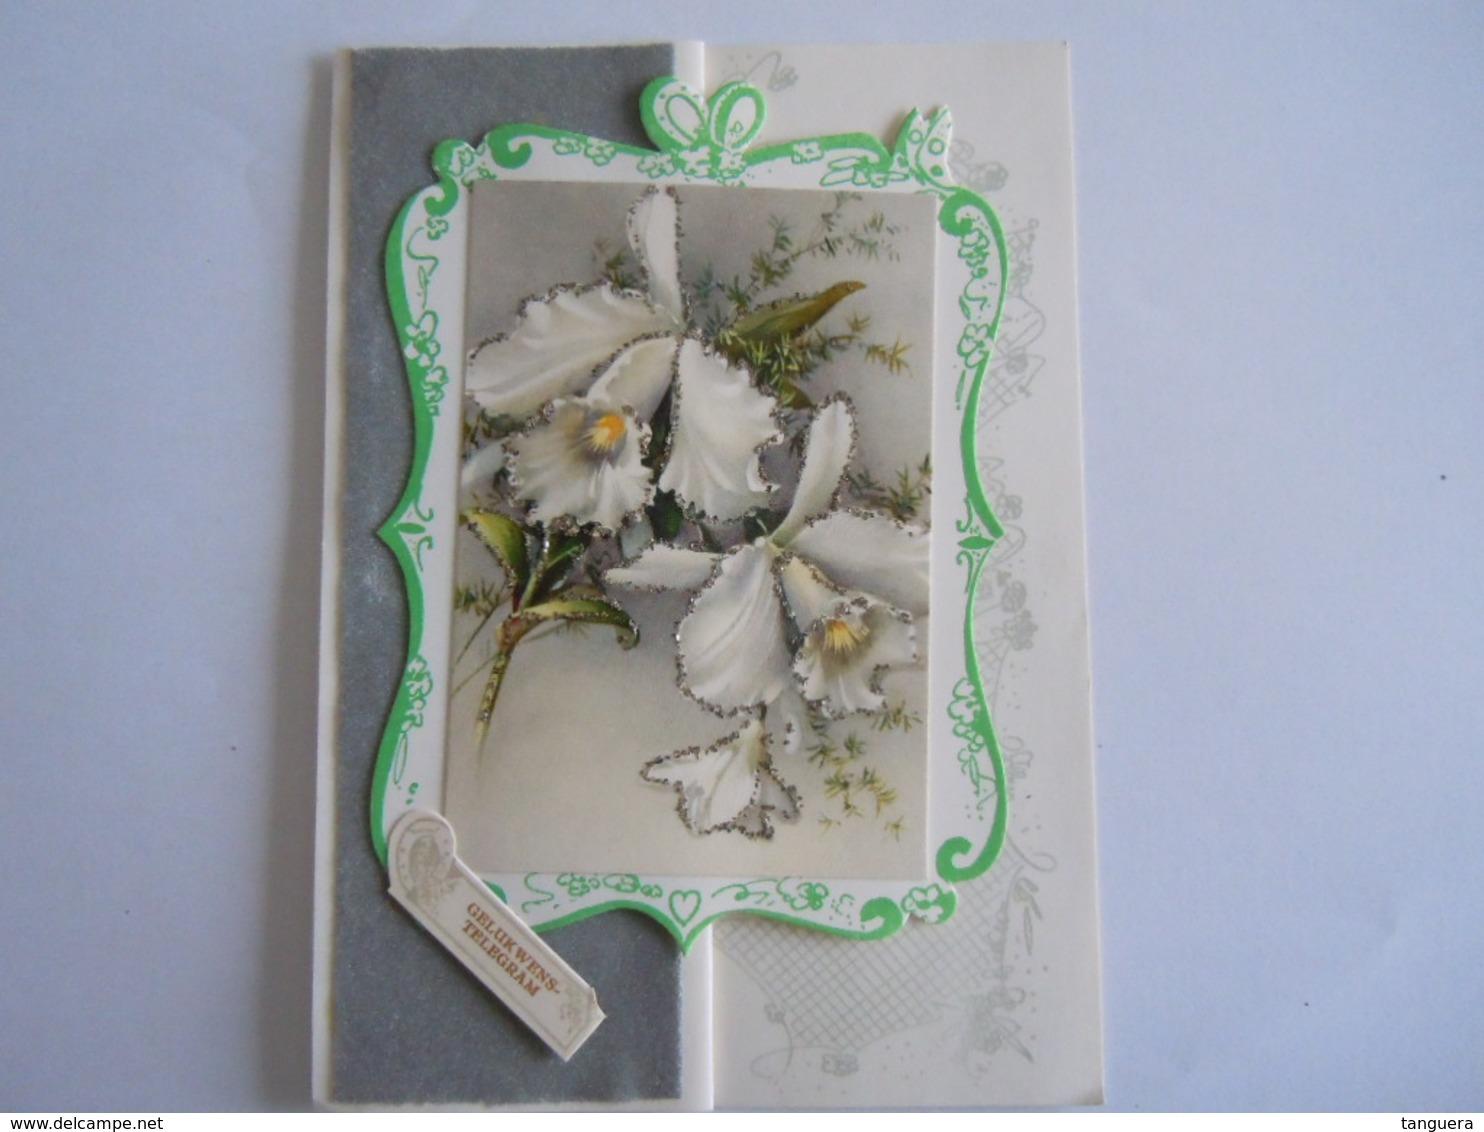 Huwelijk Mariage Geluks Telegram Télégramme De Bonheur Orchidee Pailletten Paillettes Heusden - Holidays & Celebrations